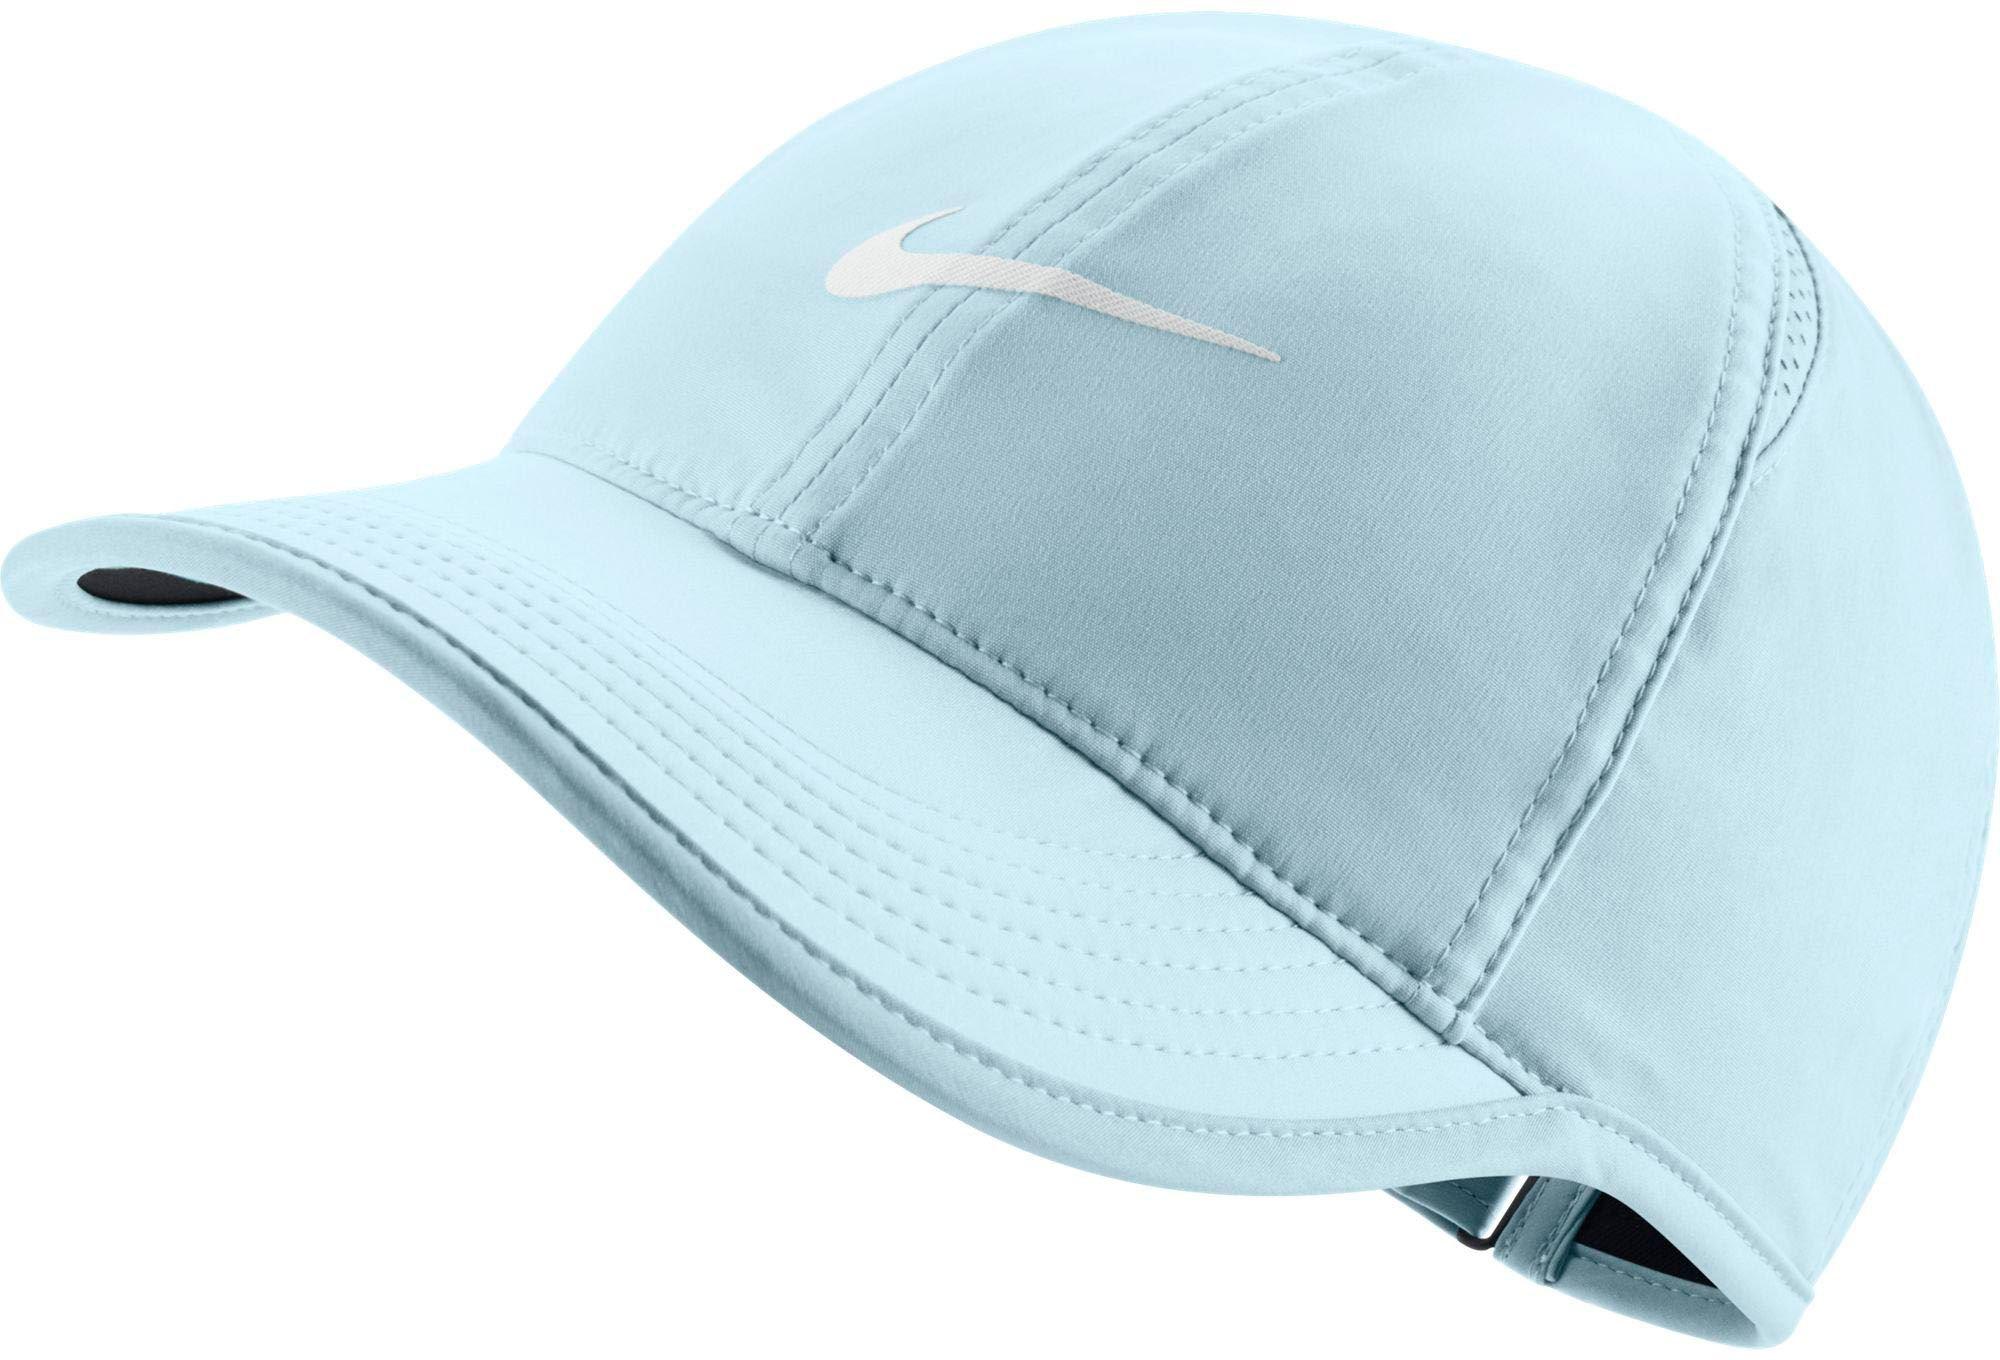 NIKE Women's Feather Light Adjustable Hat (Glacier Blue, OneSize) by Nike (Image #1)